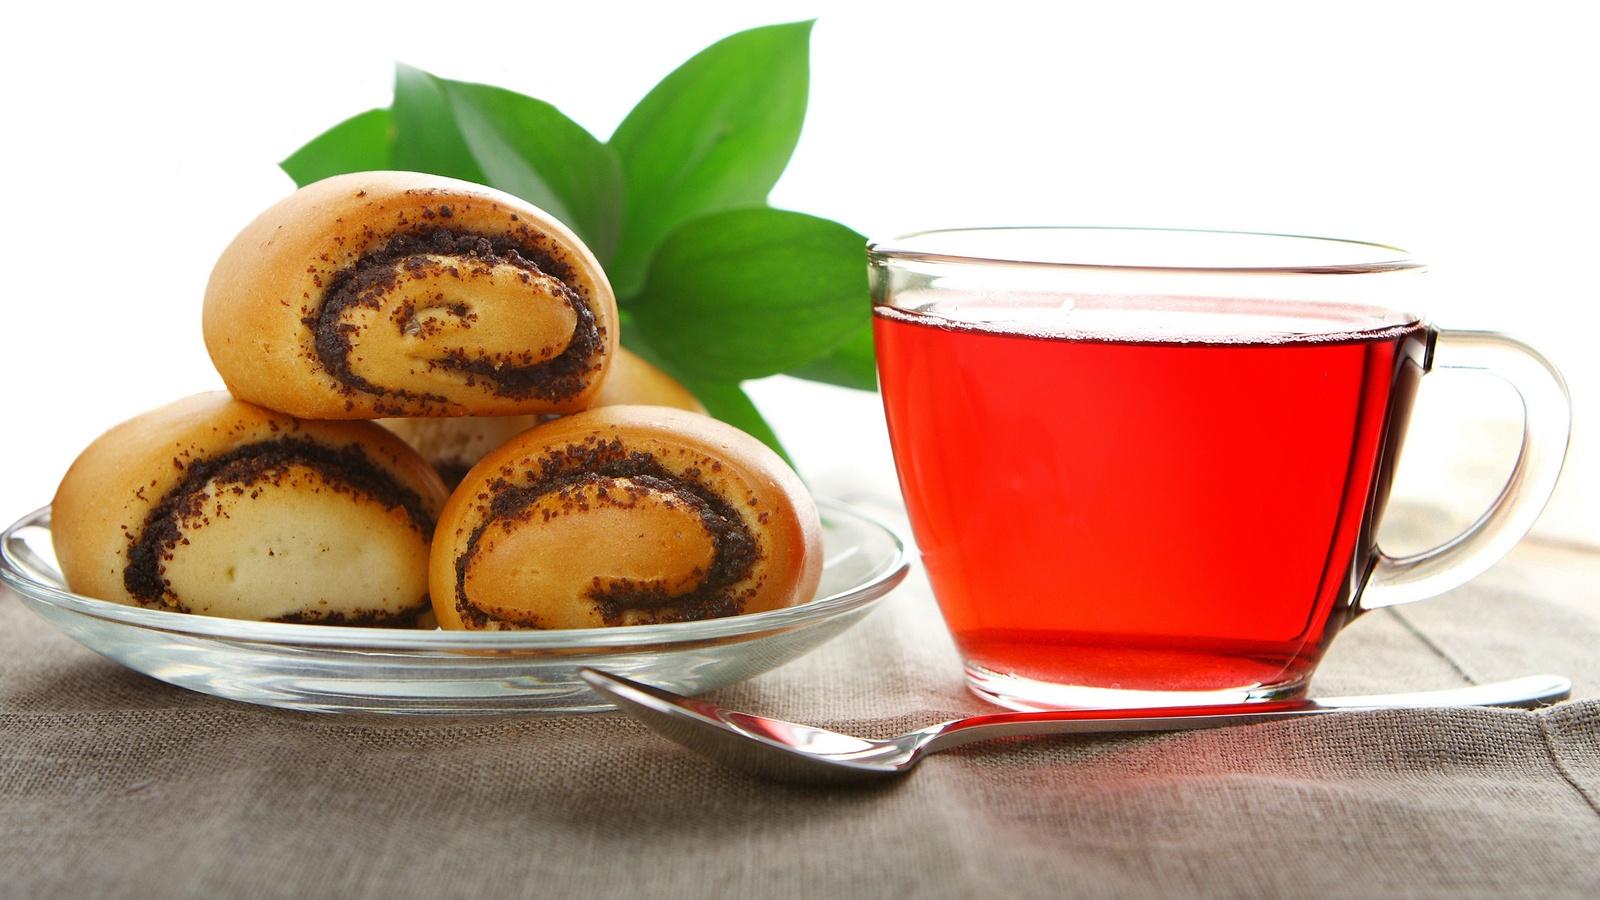 tea, стекло, Чай, ложка, чашка, булочки, мак, блюдце